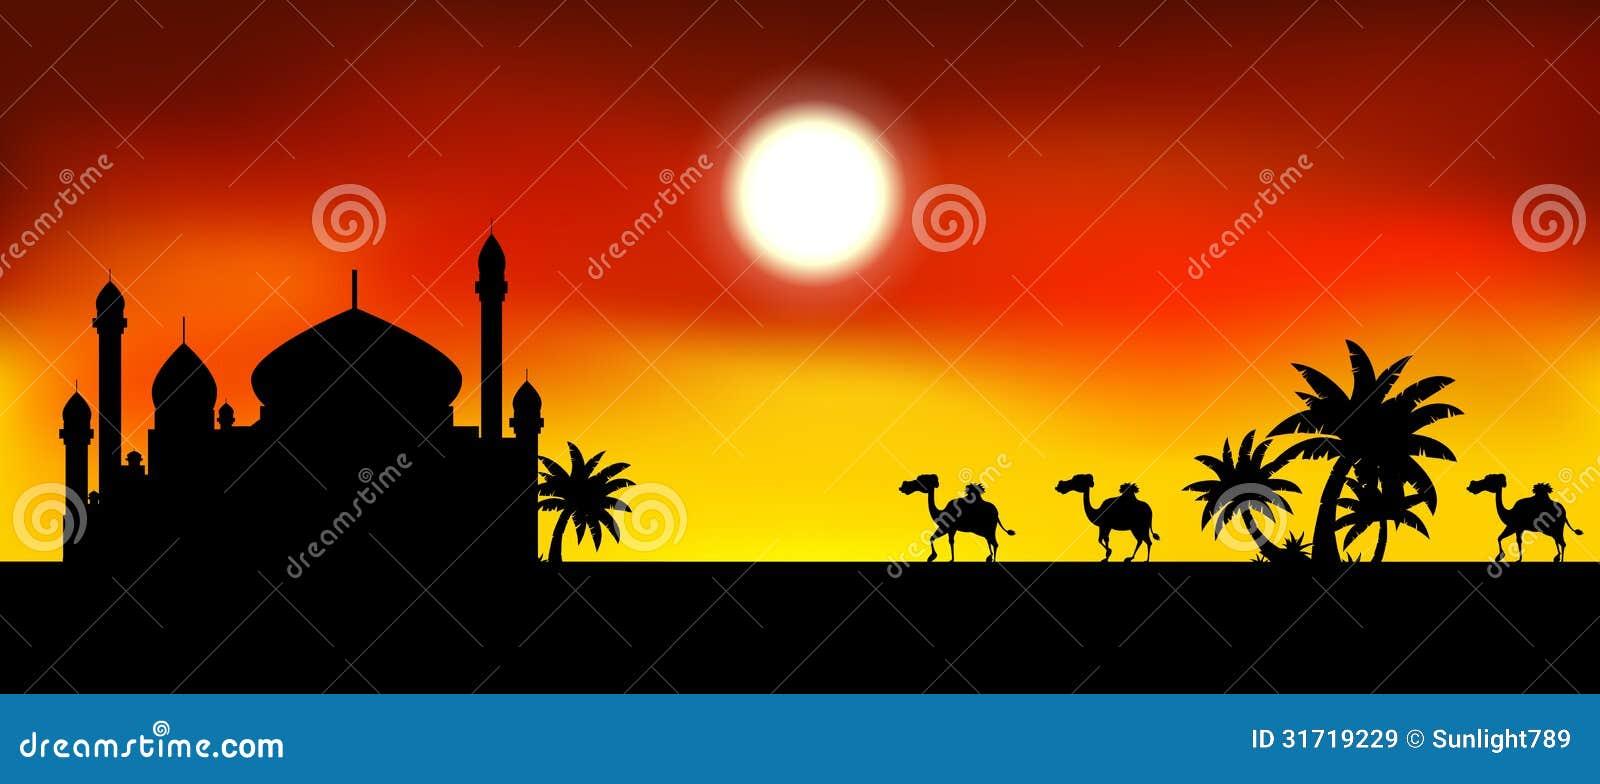 Mosque background for ramadan kareem stock photography image - Royalty Free Stock Photo Camel Illustration Kareem Mosque Ramadan